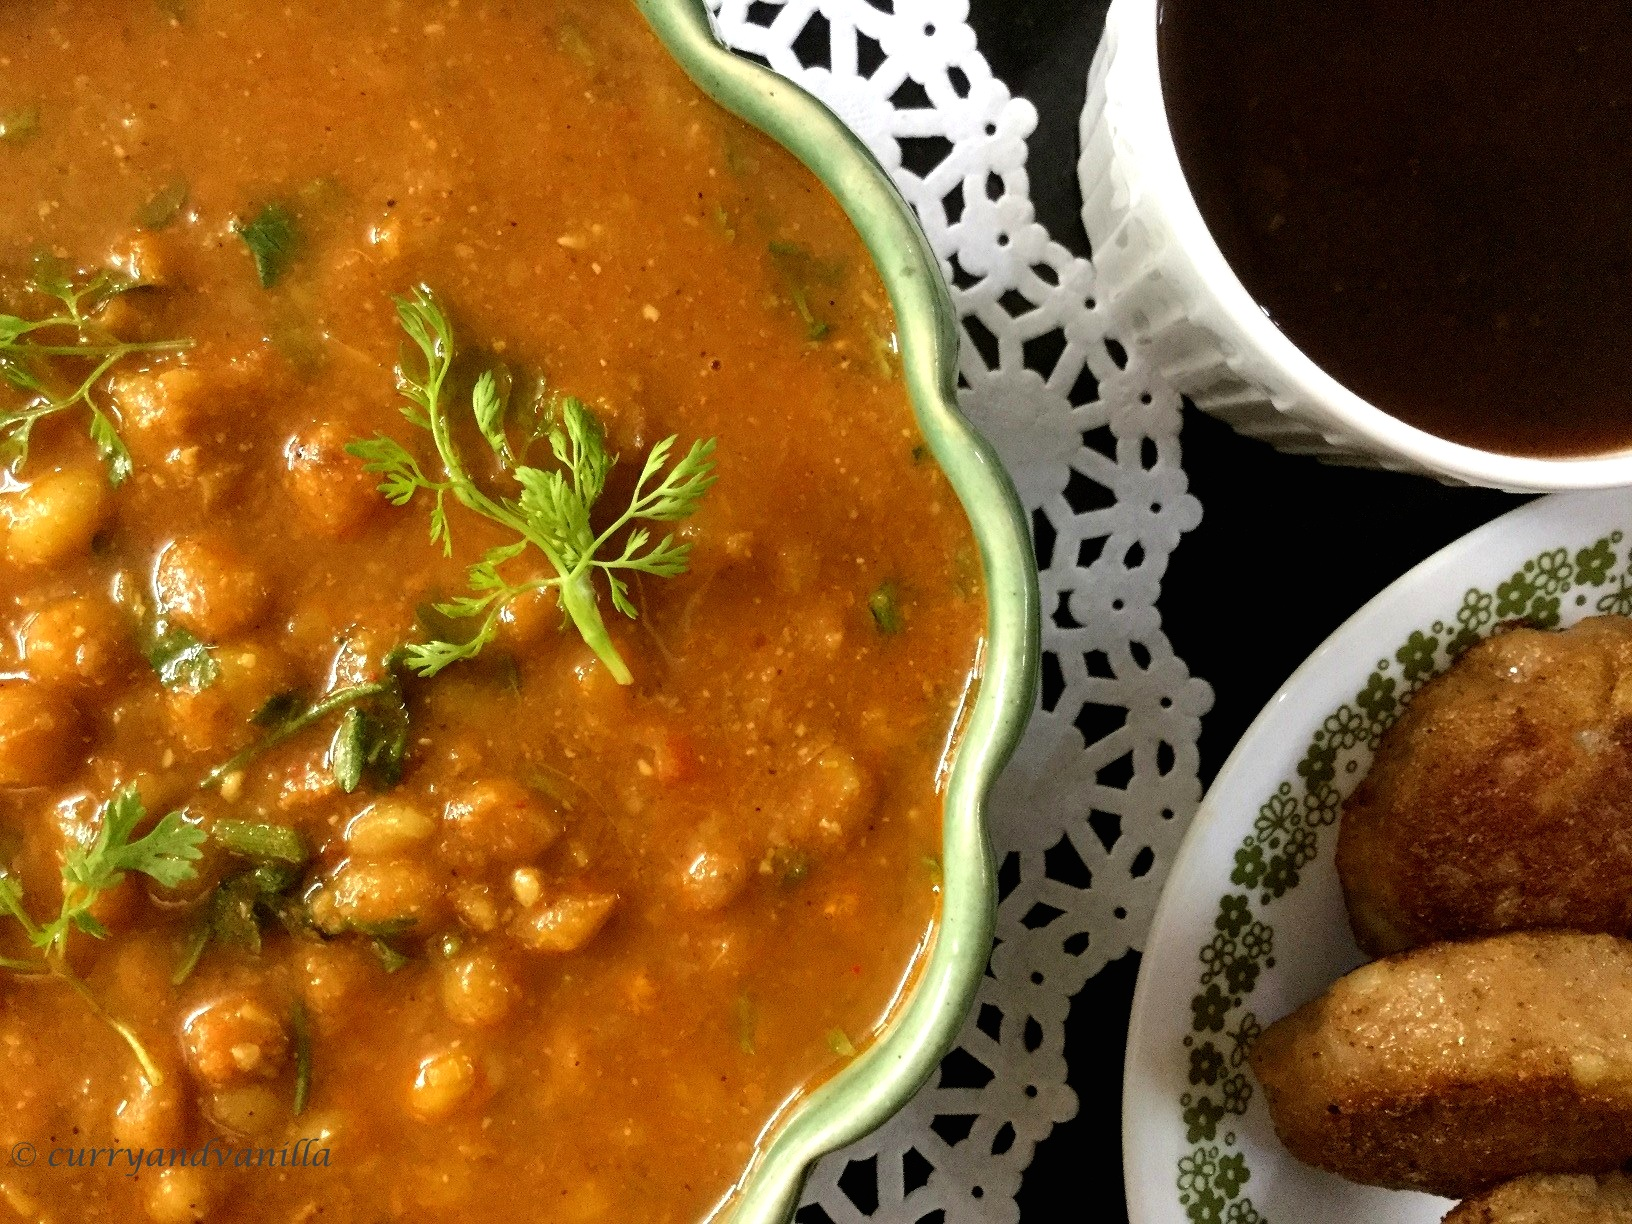 ragda patties 12 - Curry and Vanilla